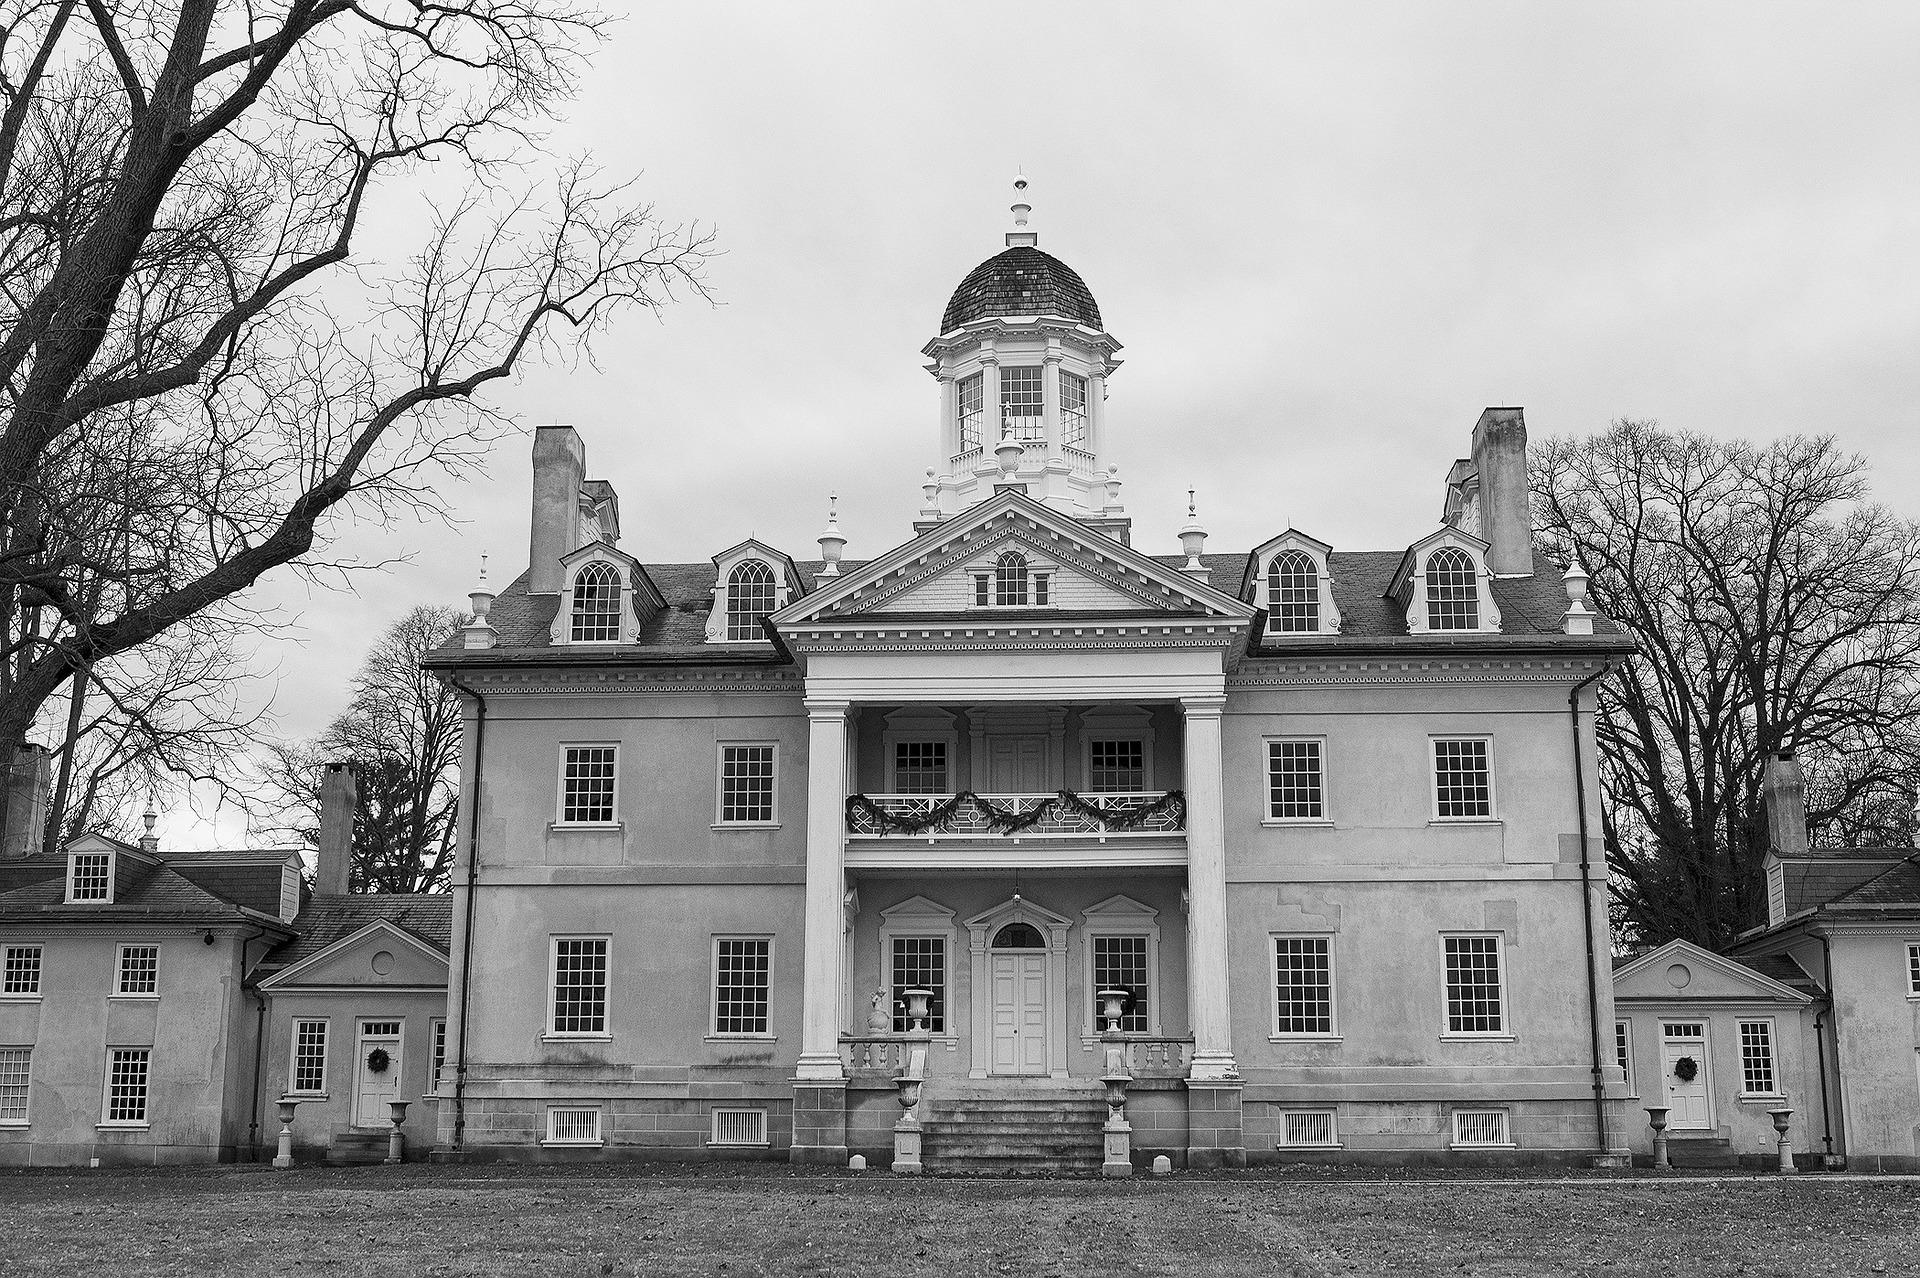 Hamilton Mansion, from Professor Slots blog on Maryland slot machine casino gambling.